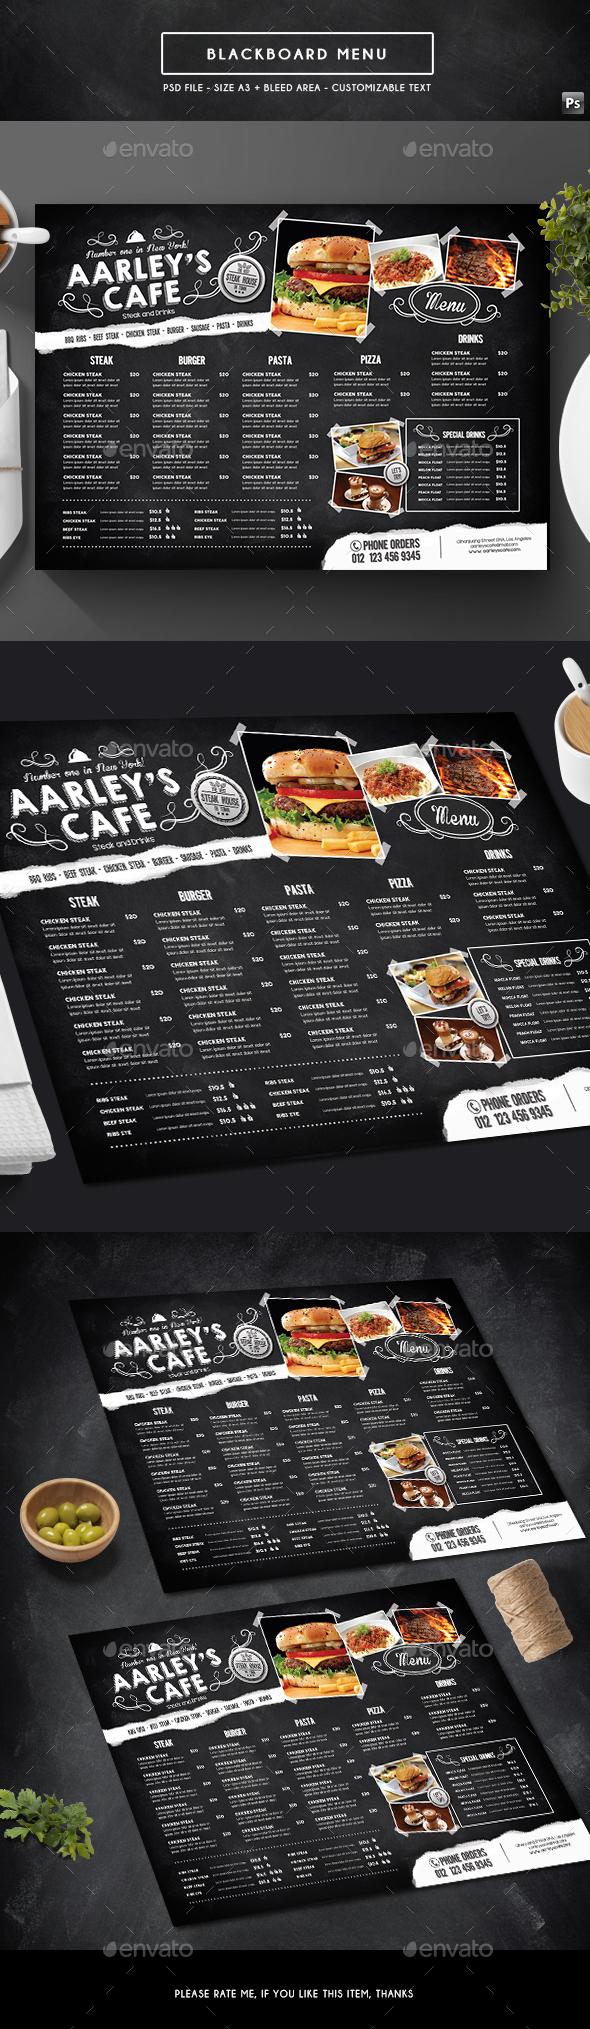 Blackboard Menu - Food Menus Print Templates